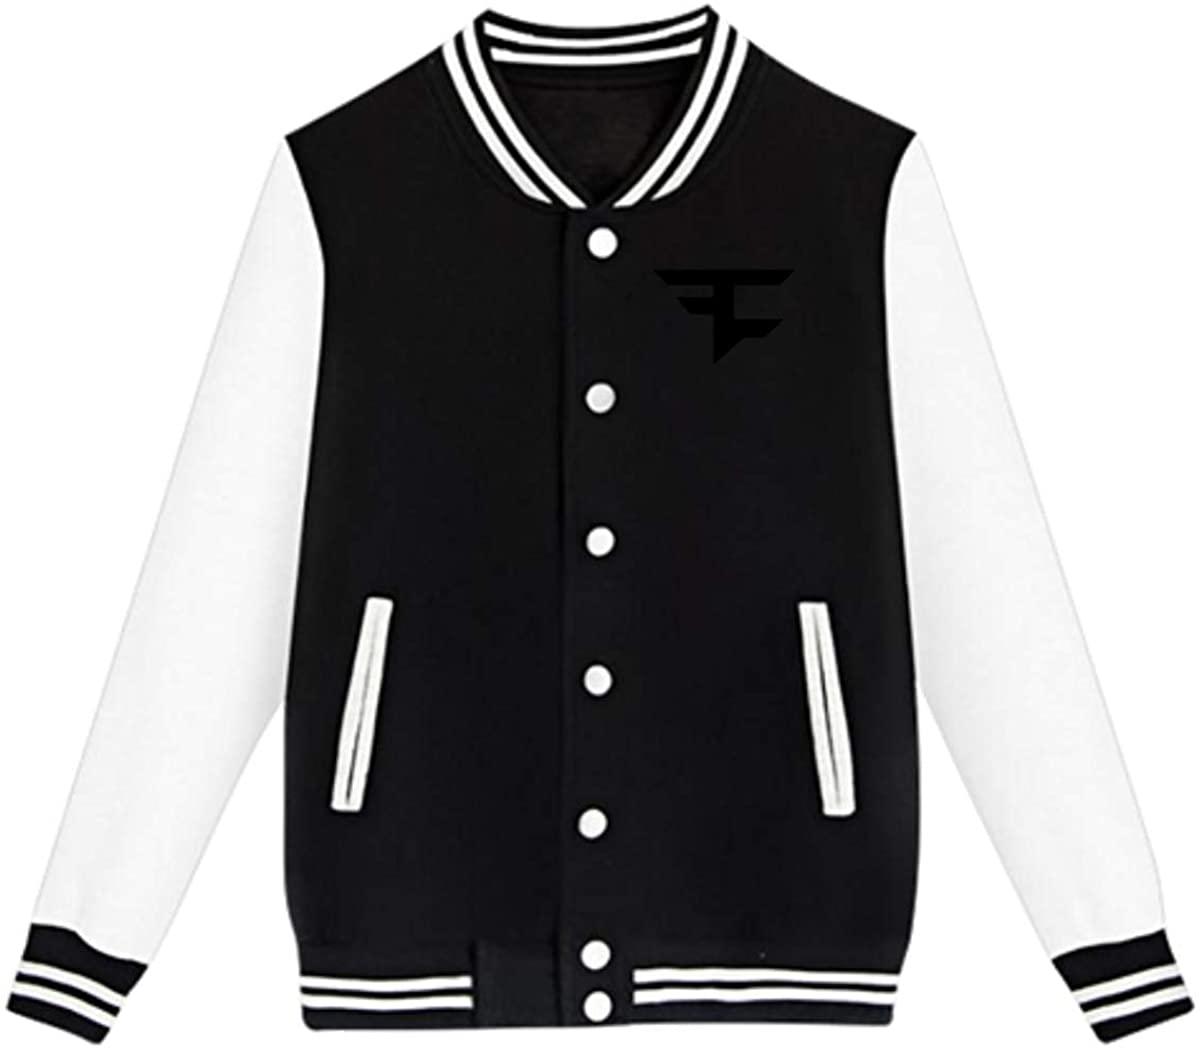 Faze Clan Logo Unisex Youth Boys and Girls Sweatshirt Baseball Uniform Jacket Sport Coat